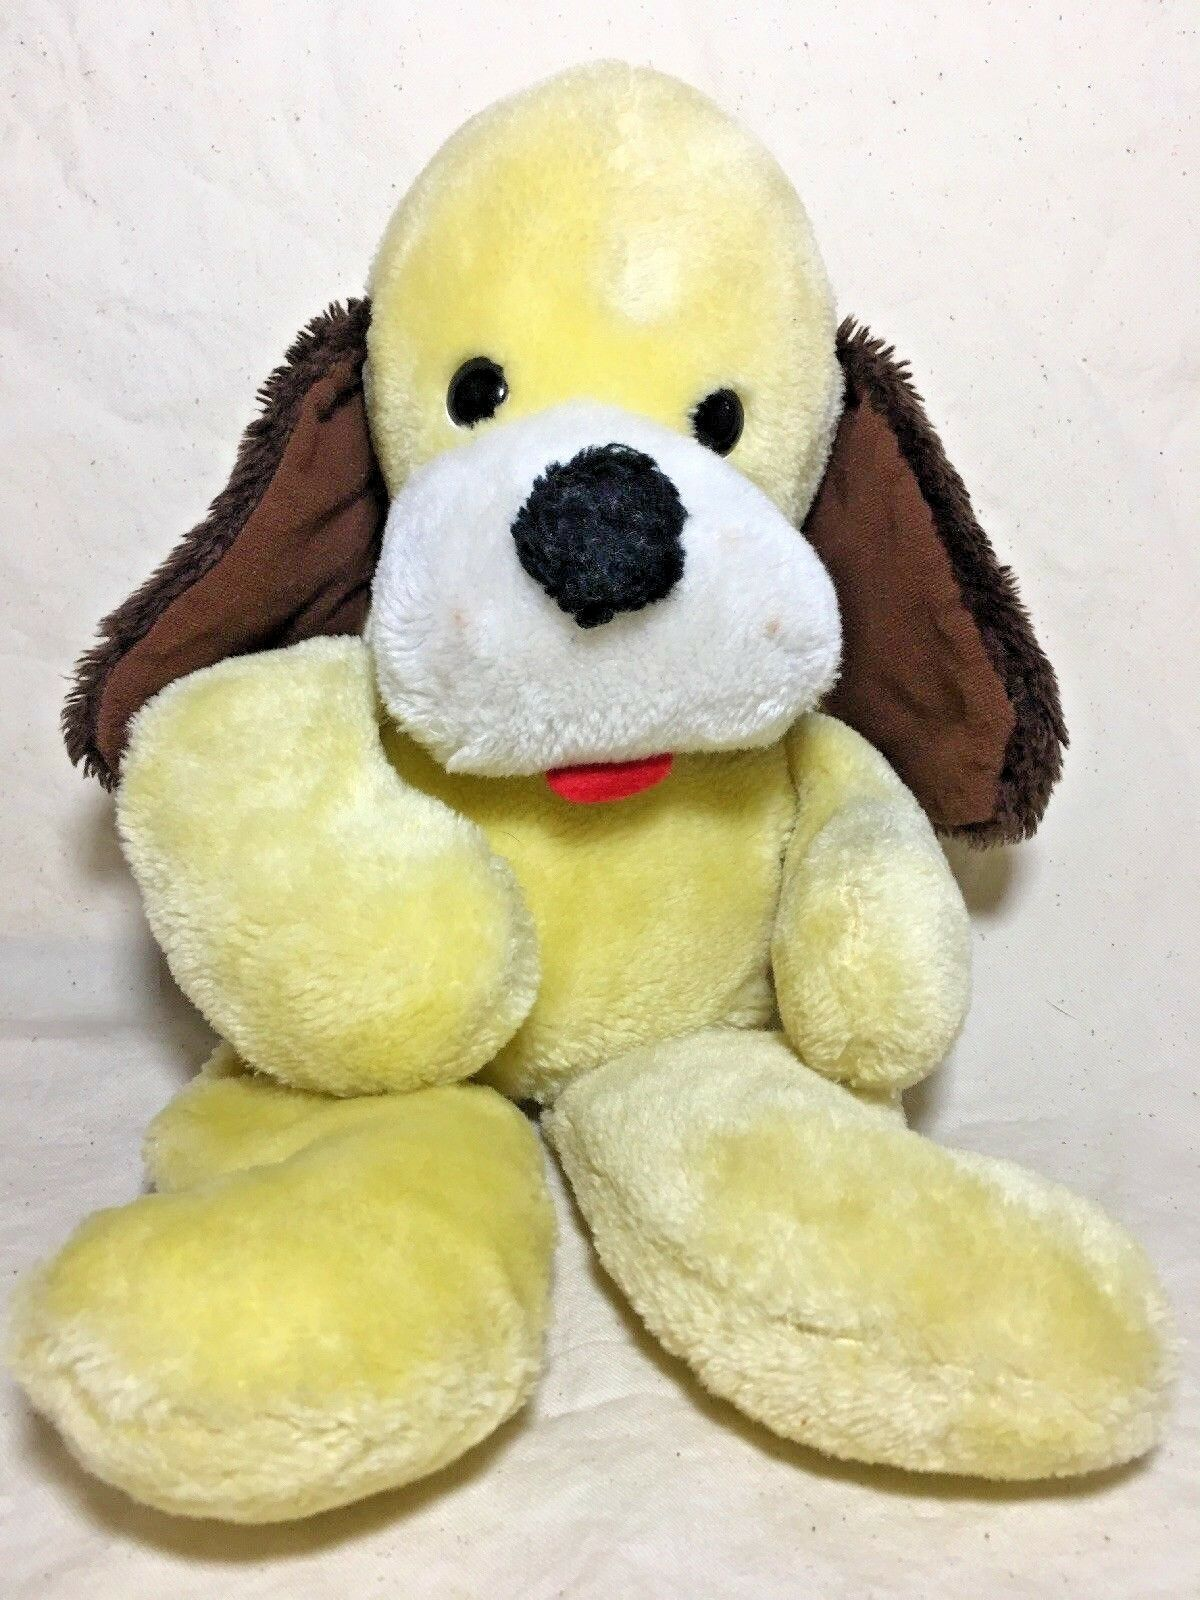 VINTAGE ANIMAL FAIR 17in Puppy Dog Plush Stuffed Animal Yellow Dog Collectible